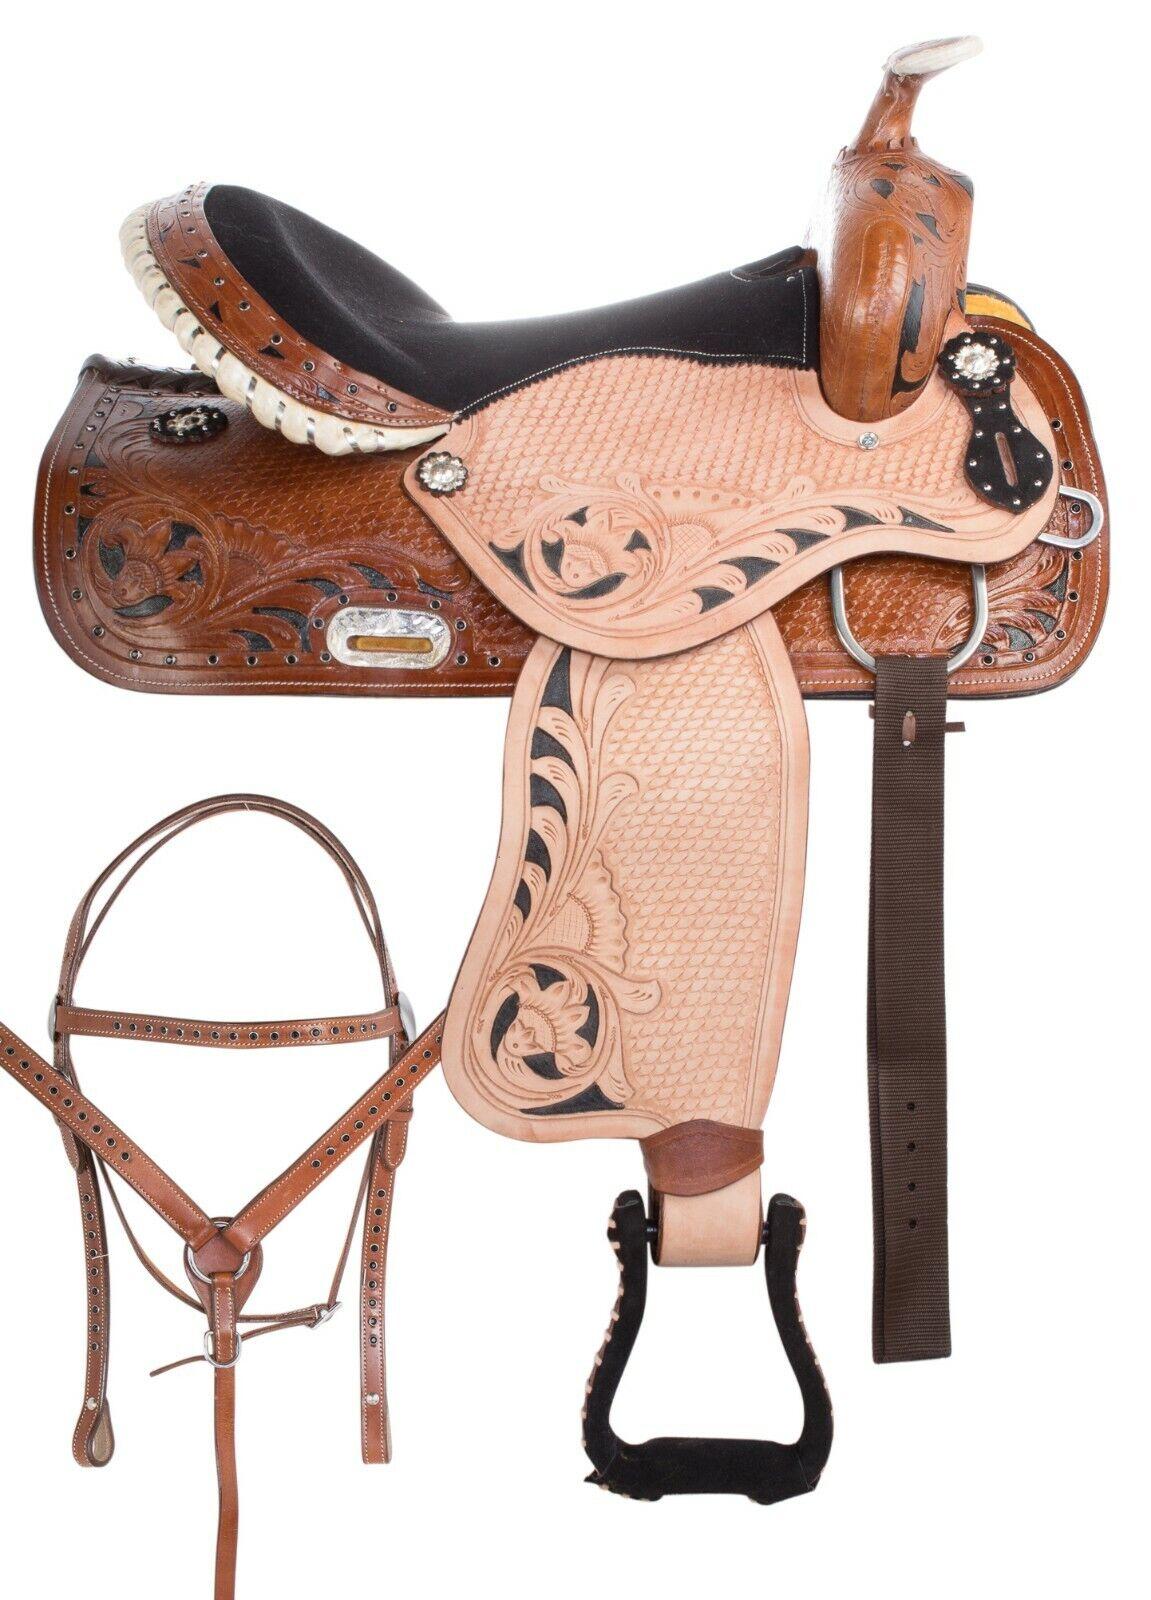 14 15 16 17  PLEASURE TOOLED LEATHER BARREL RACING WESTERN TRAIL HORSE SADDLE  quality assurance